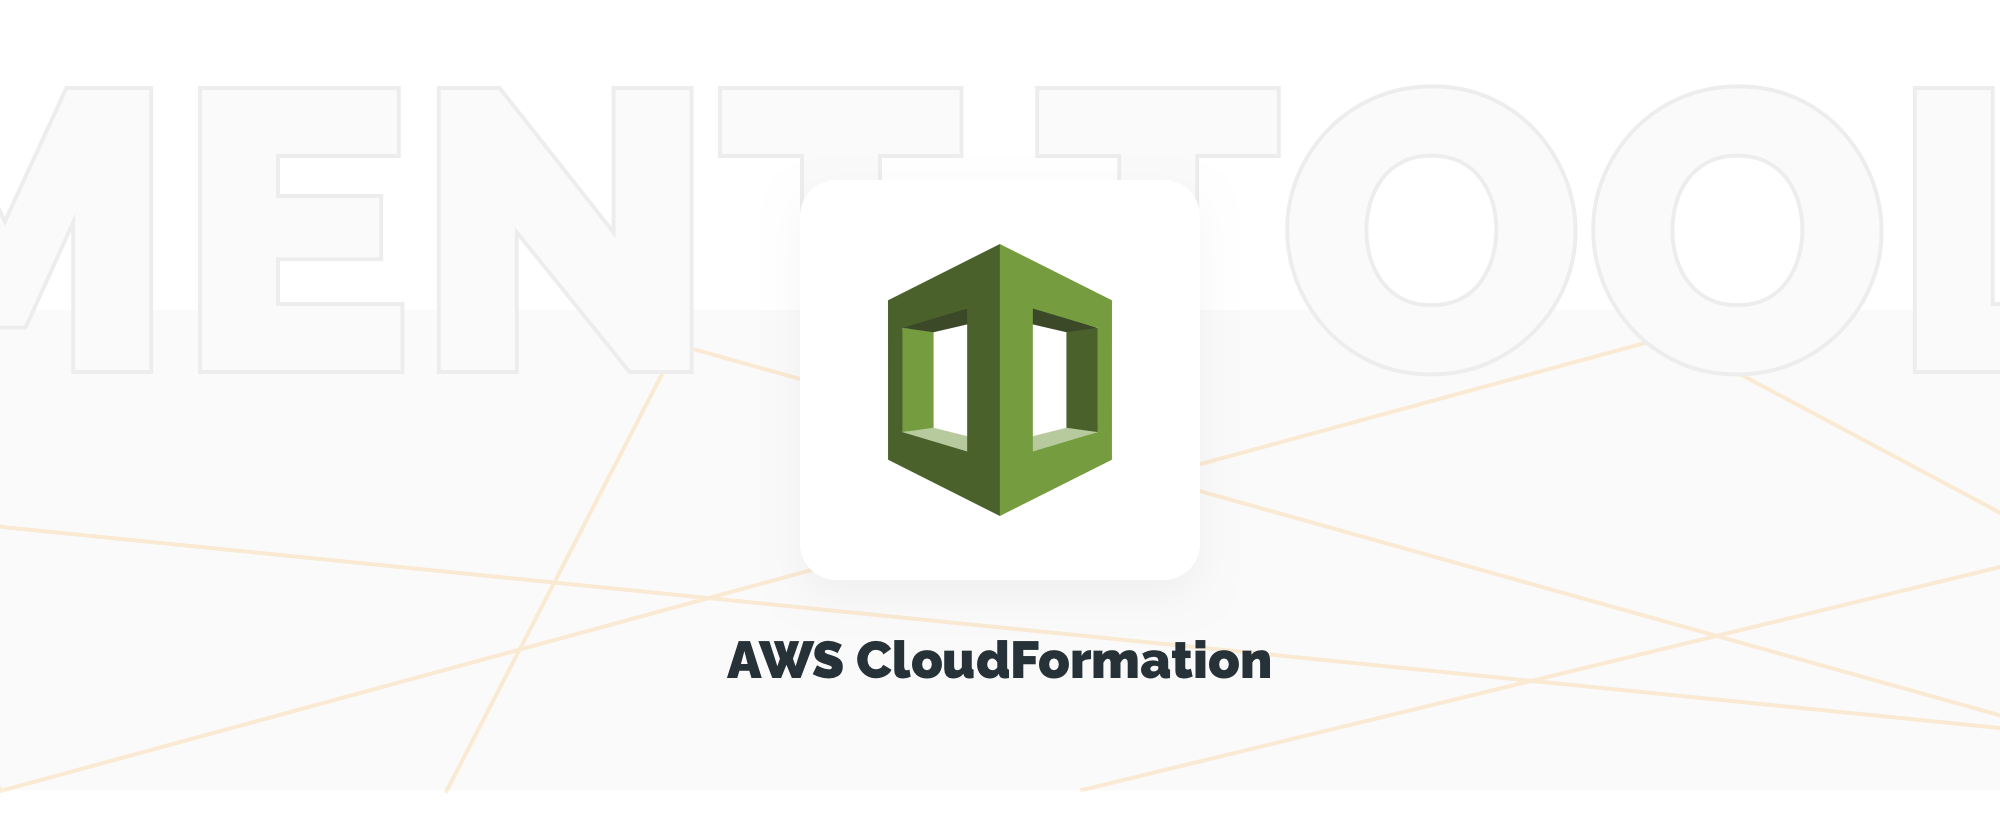 AWS CloudFormation